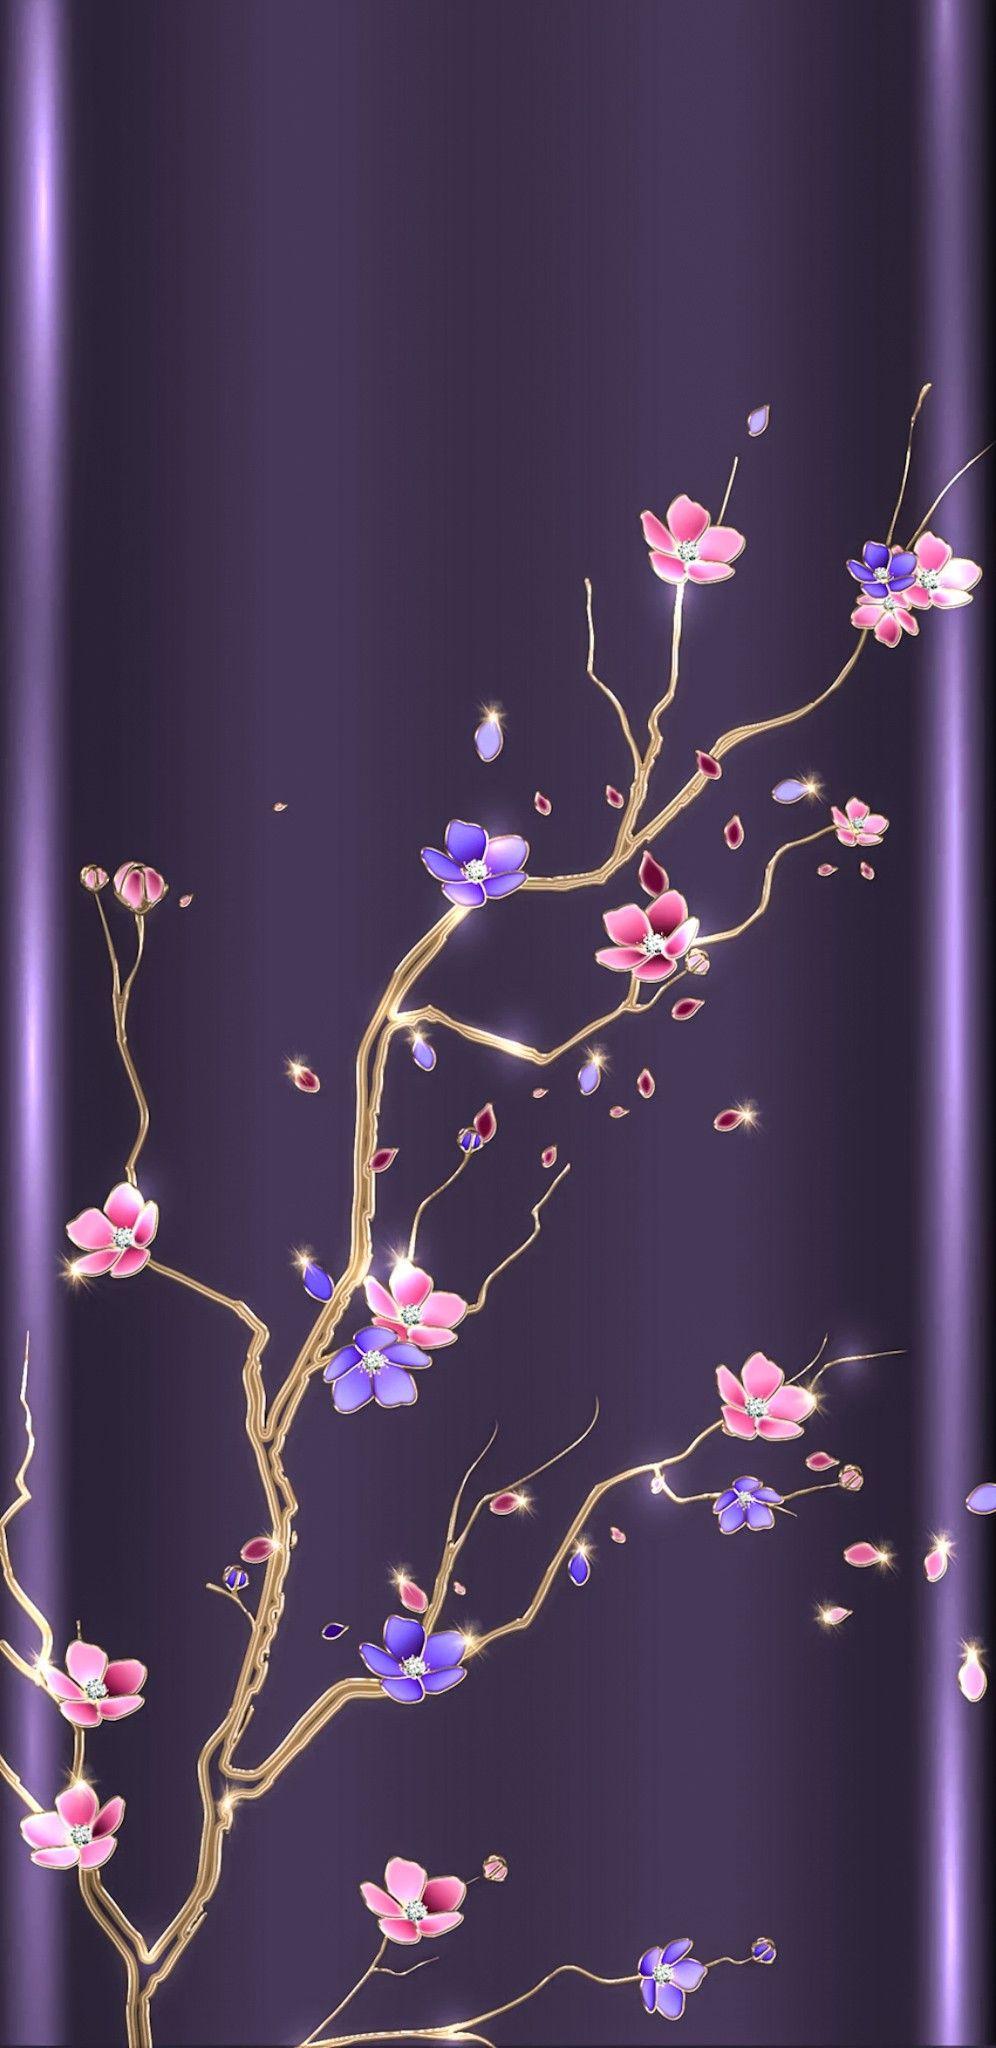 Wallpaper Lockscreen Iphone Android Flower Wallpaper Floral Wallpaper Pretty Wallpapers